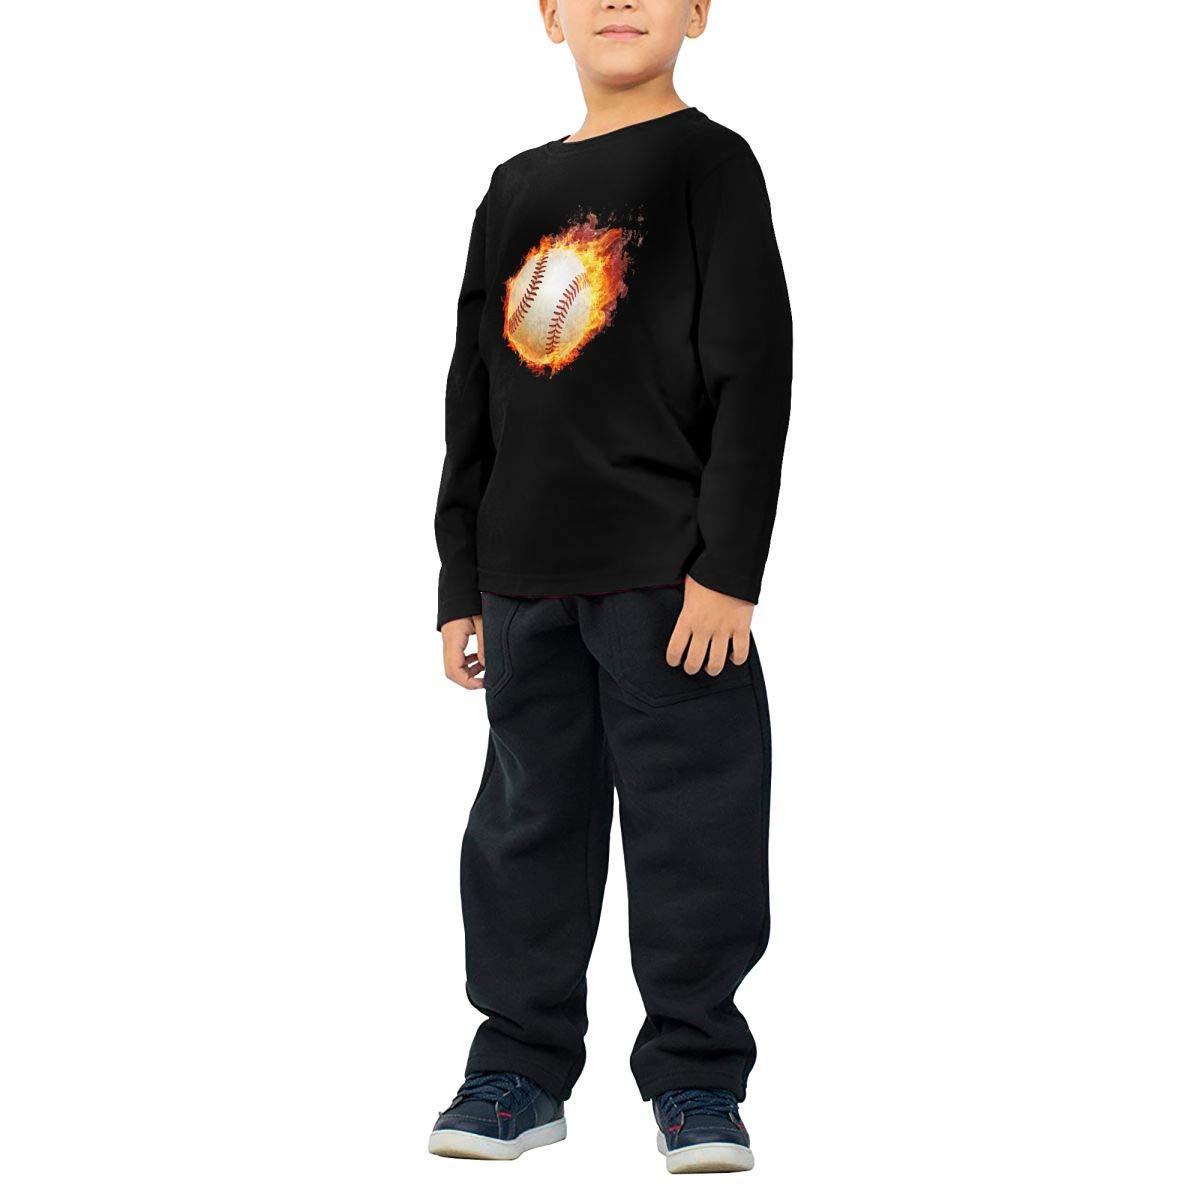 COTDREN Burning Baseball Boys Cotton Long Sleeve Tshirt